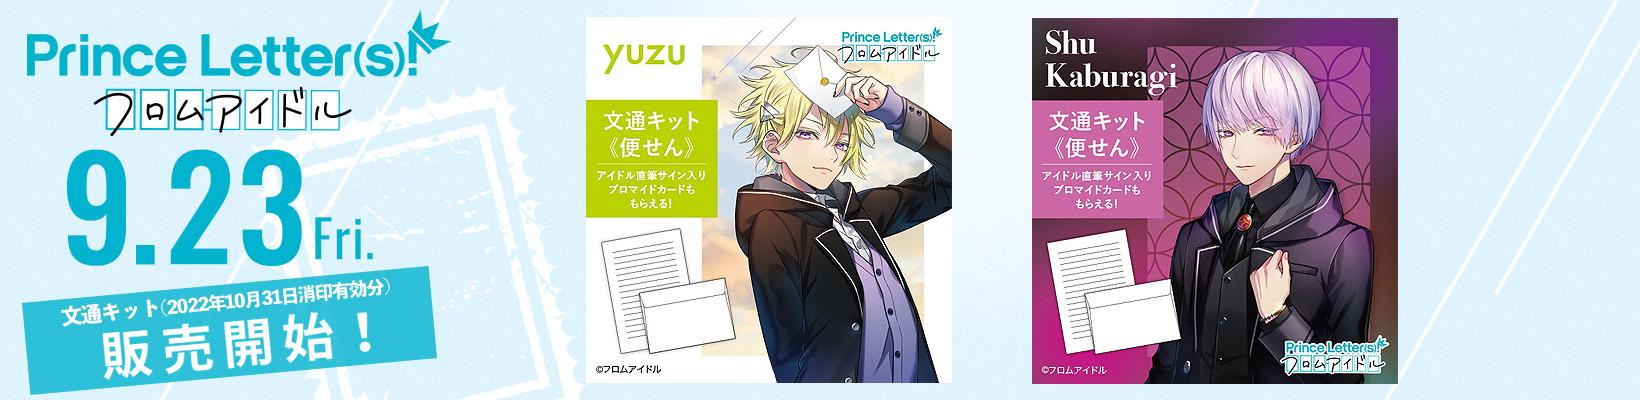 Prince Letter(s)!フロムアイドル  9.23wed. 販売開始!